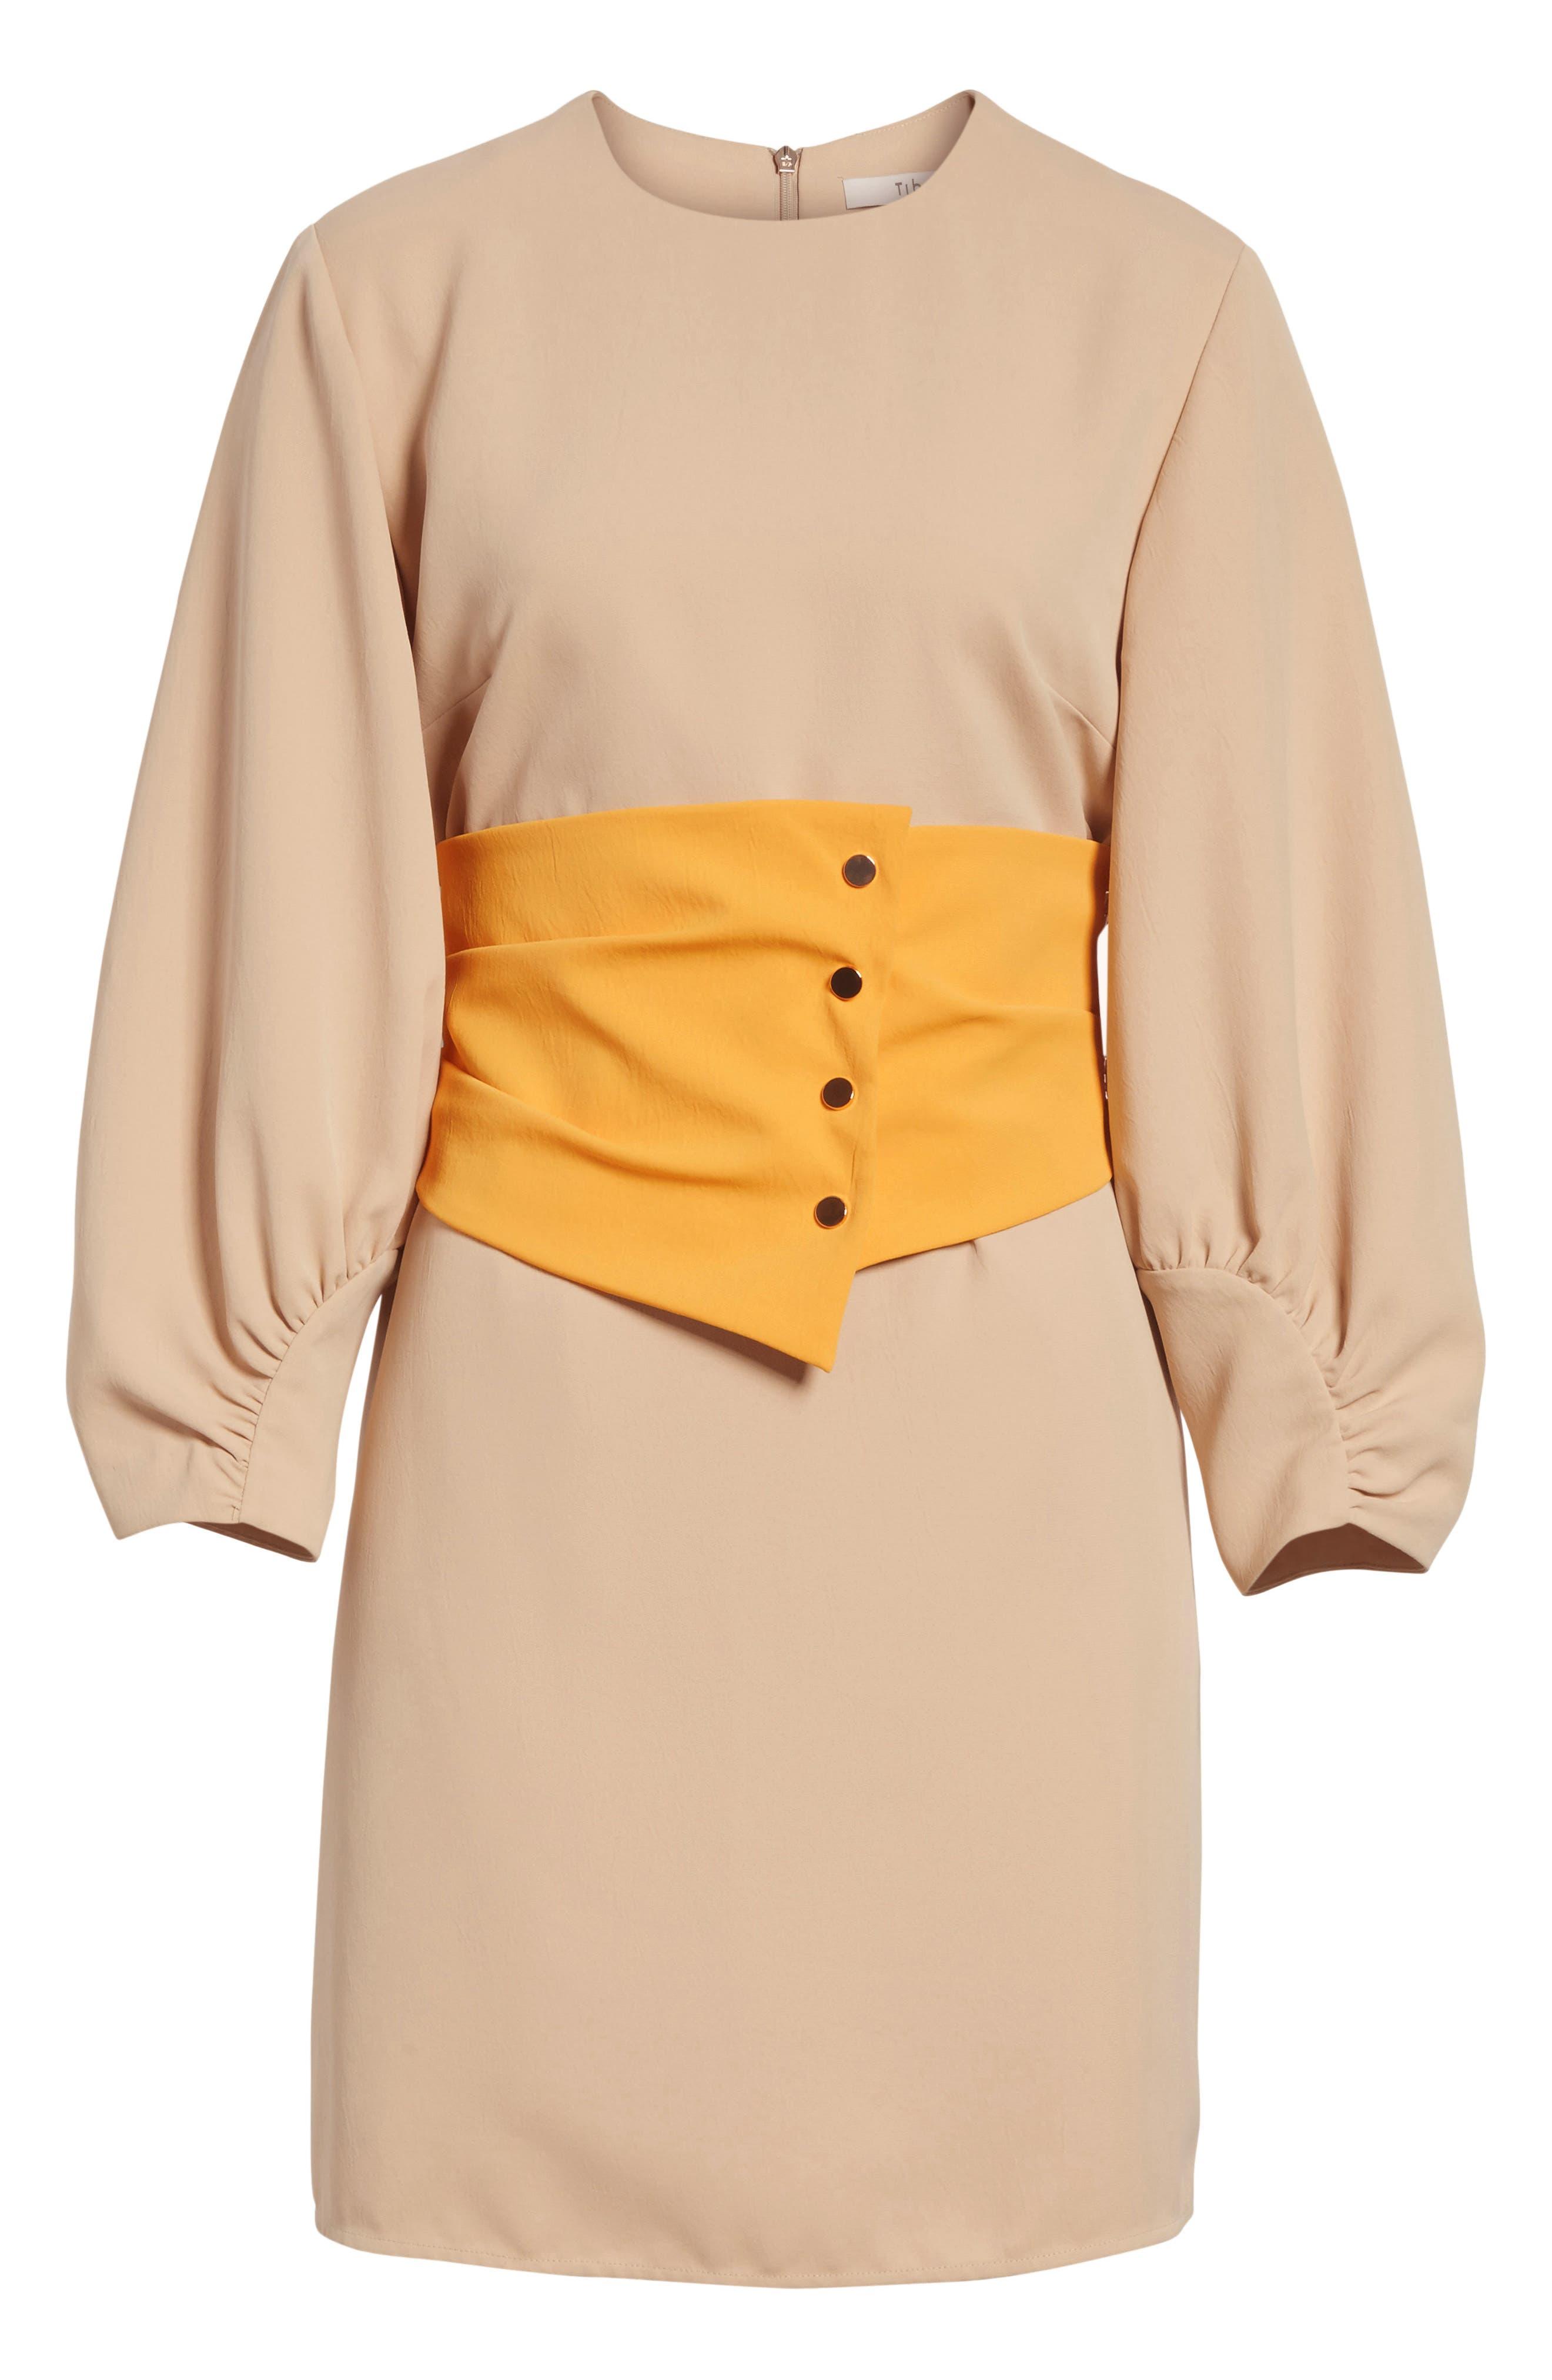 Shirred Sleeve Corset Dress,                             Alternate thumbnail 7, color,                             NUDE/ ORANGE MULTI